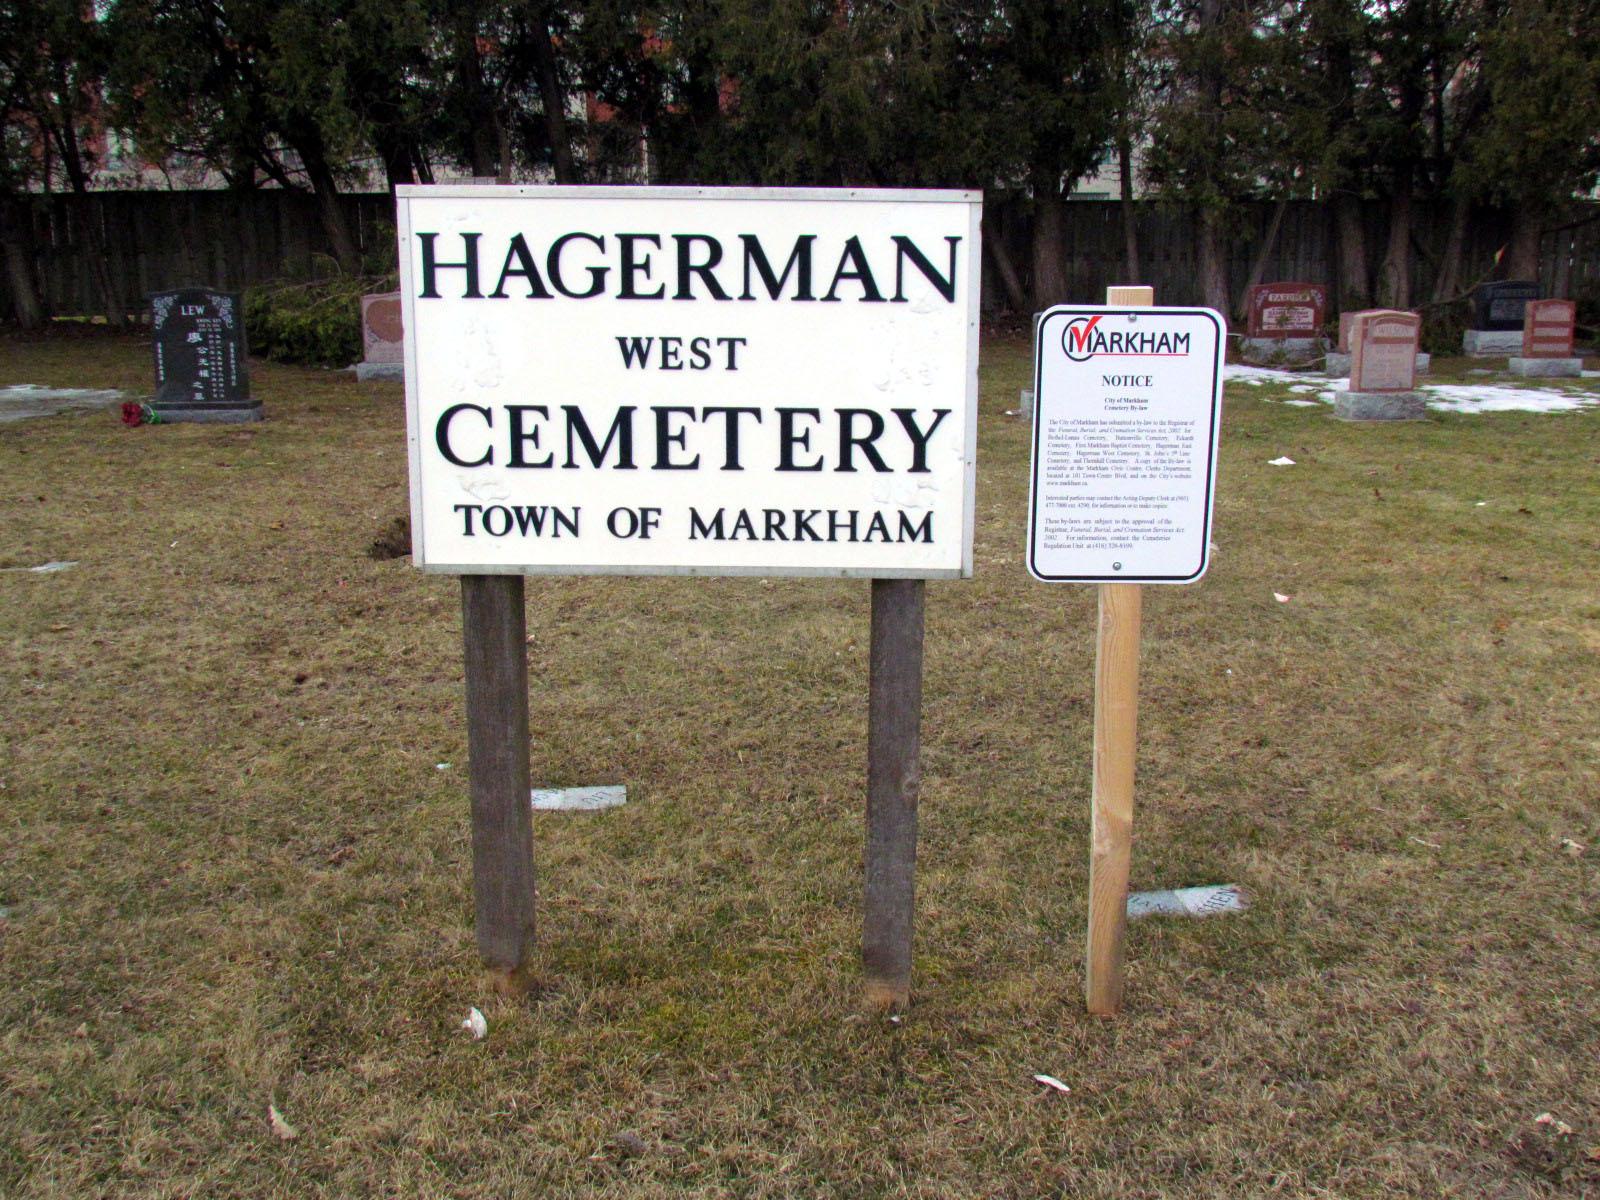 Hagerman West Cemetery